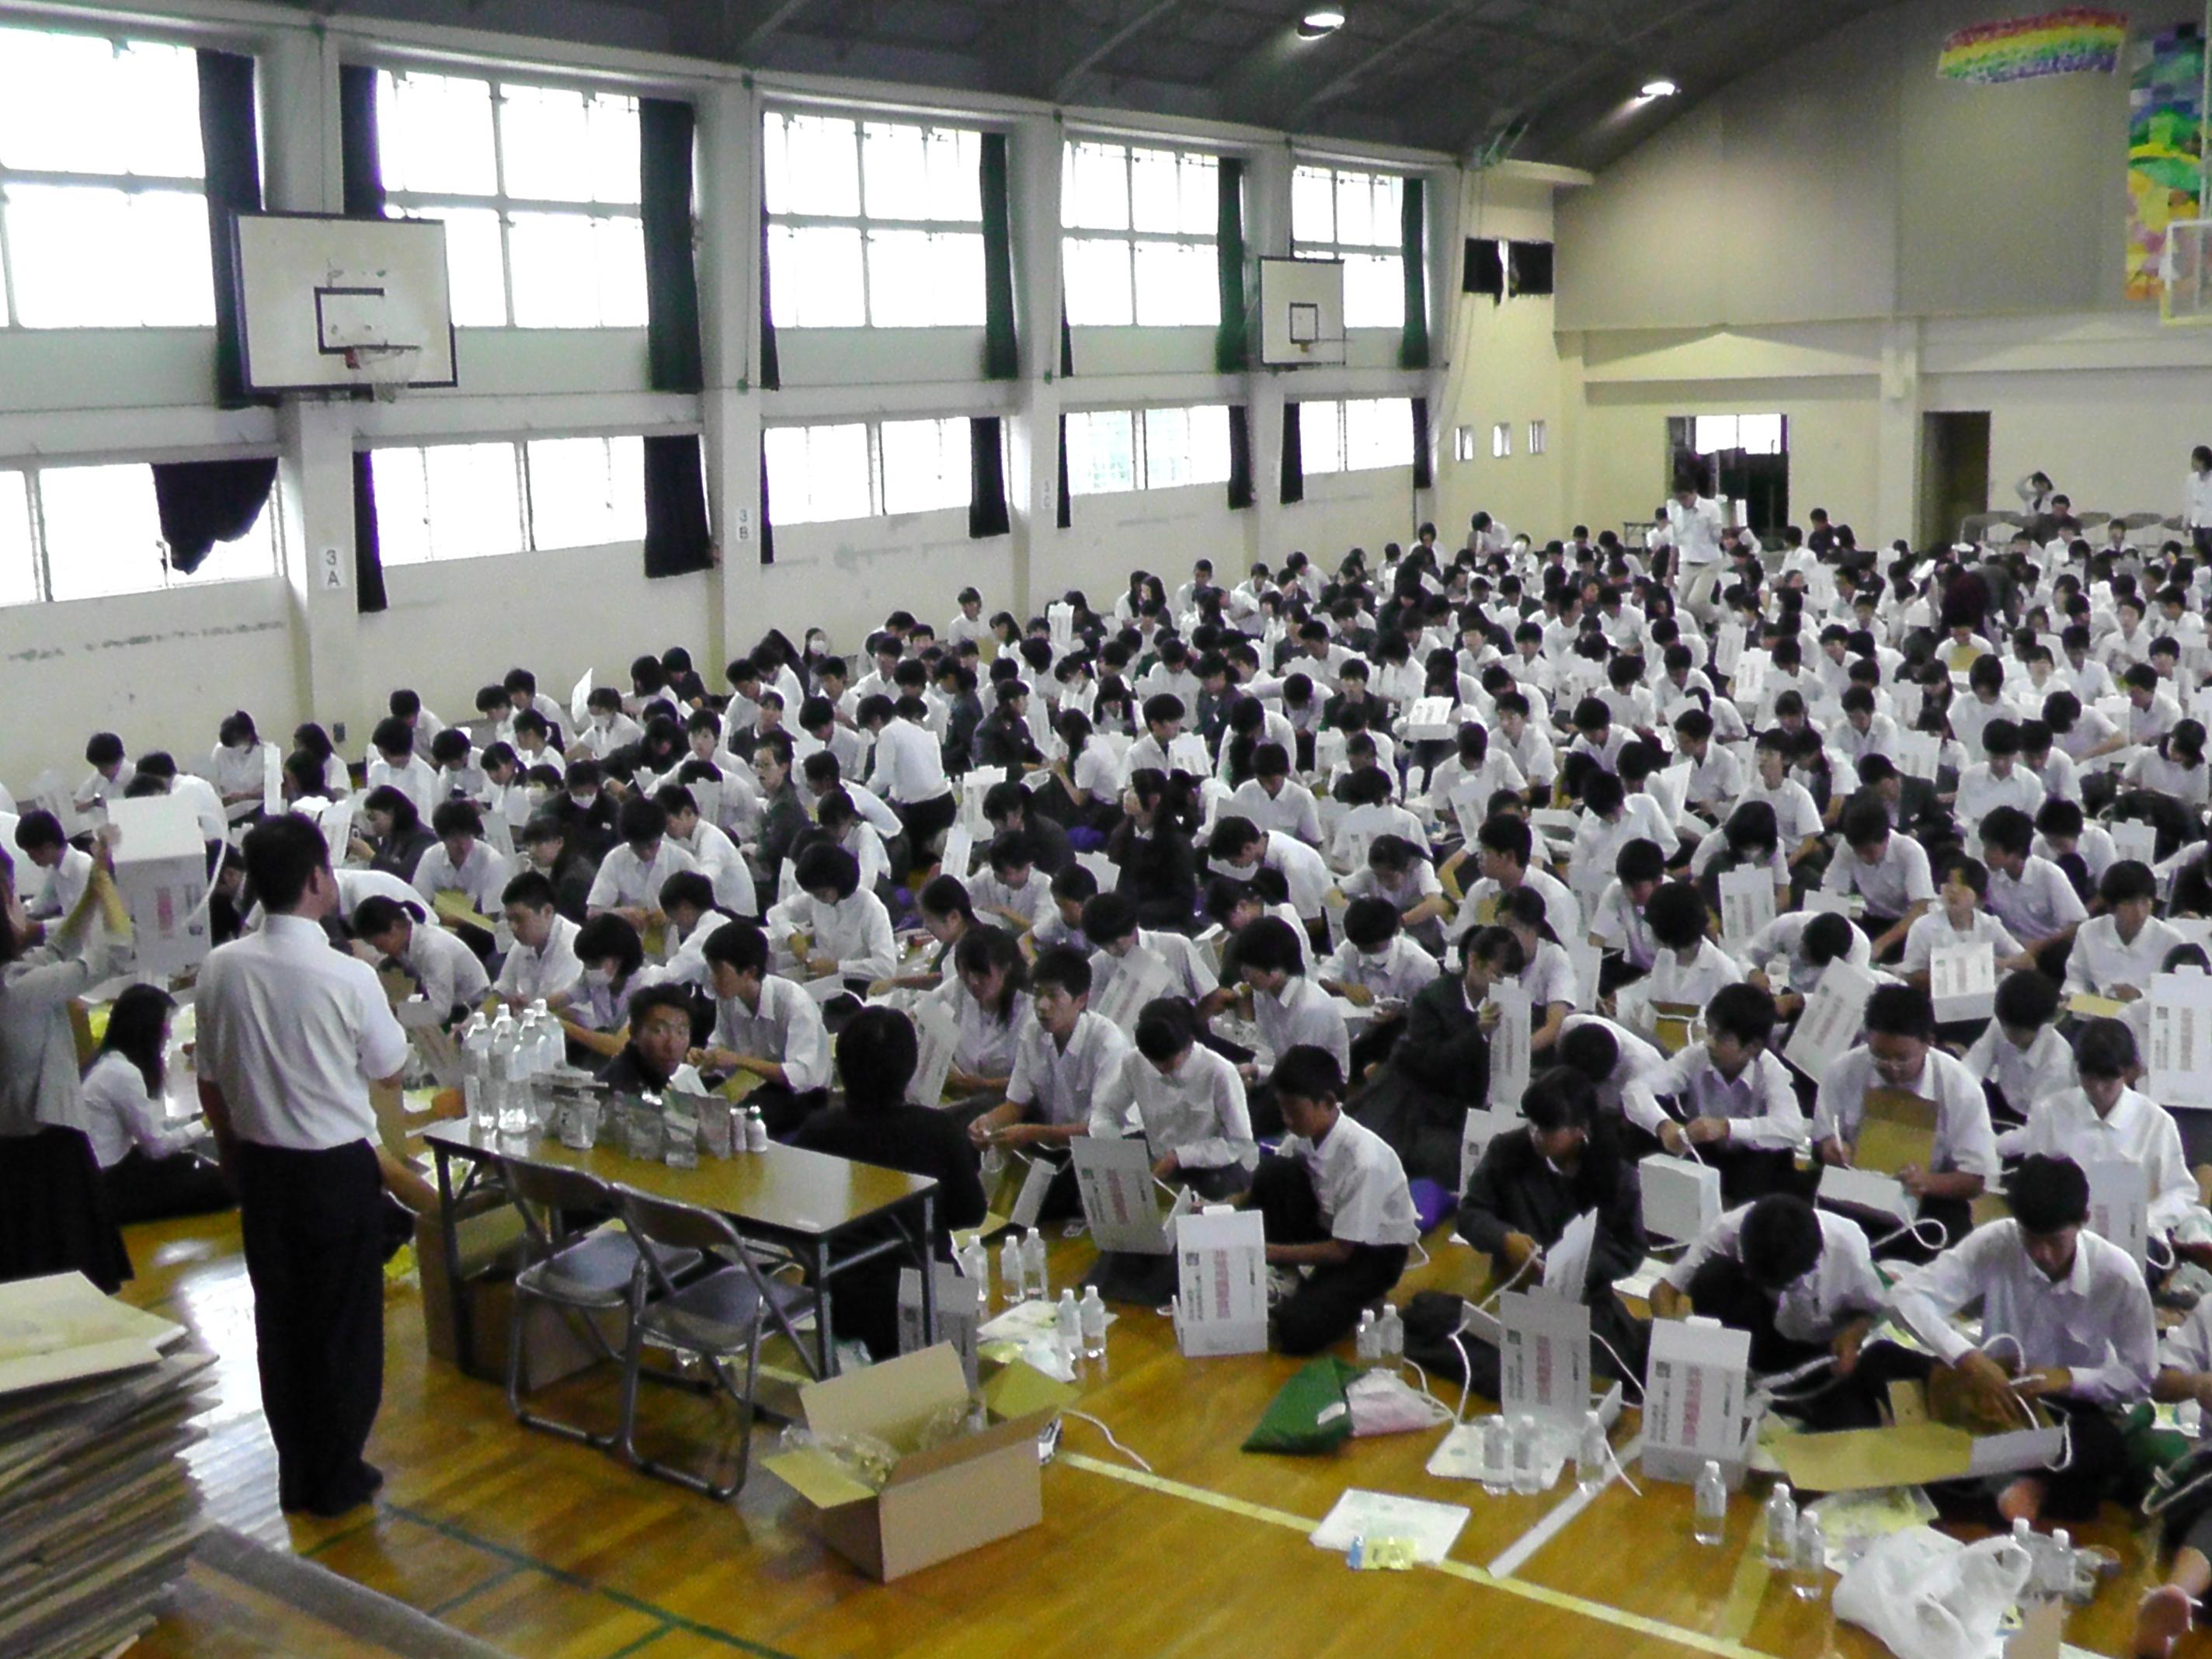 http://www.fuzoku.edu.mie-u.ac.jp/chu/%E3%81%BA%E3%81%98%EF%BC%94%EF%BC%91.JPG